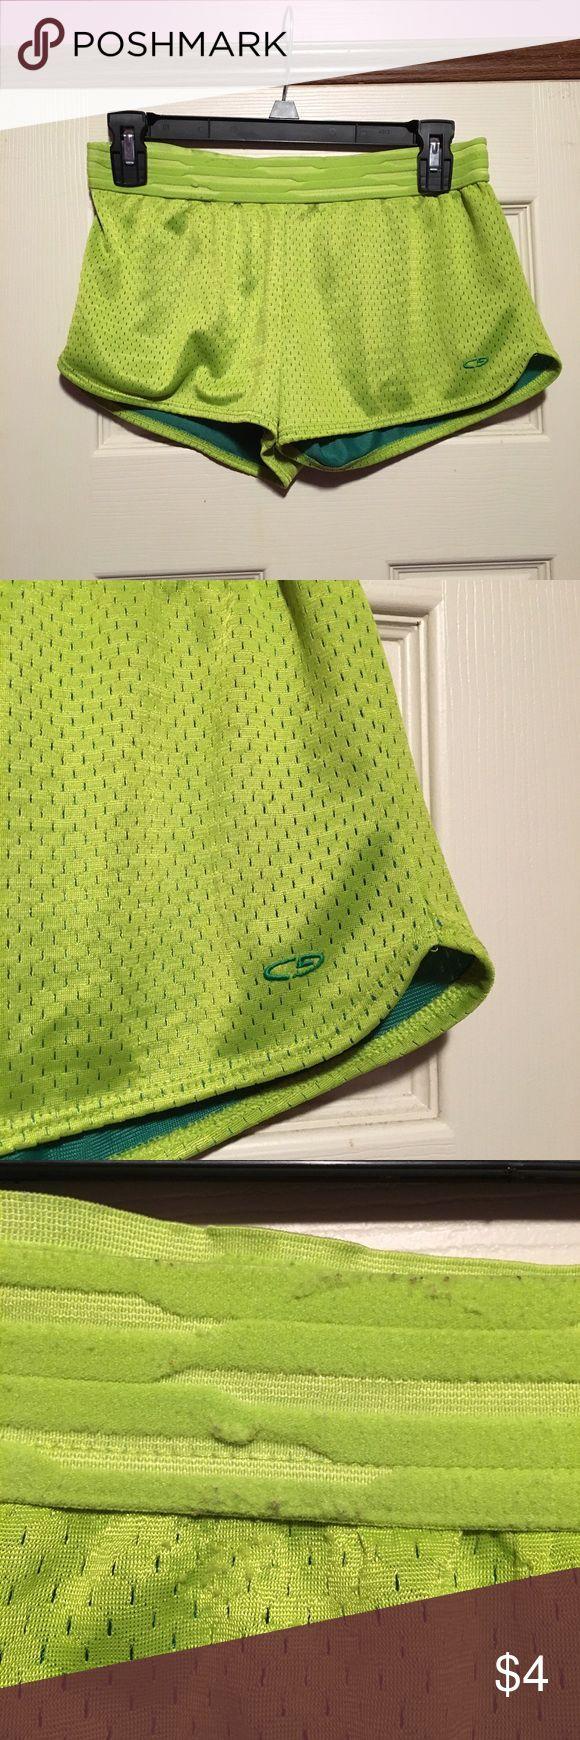 Lime green mesh shorts Short mesh shorts. Size small. Yellow green and green. Has piling and wear on the waistband and wear on the mesh as pictured. Ships next day. Shorts